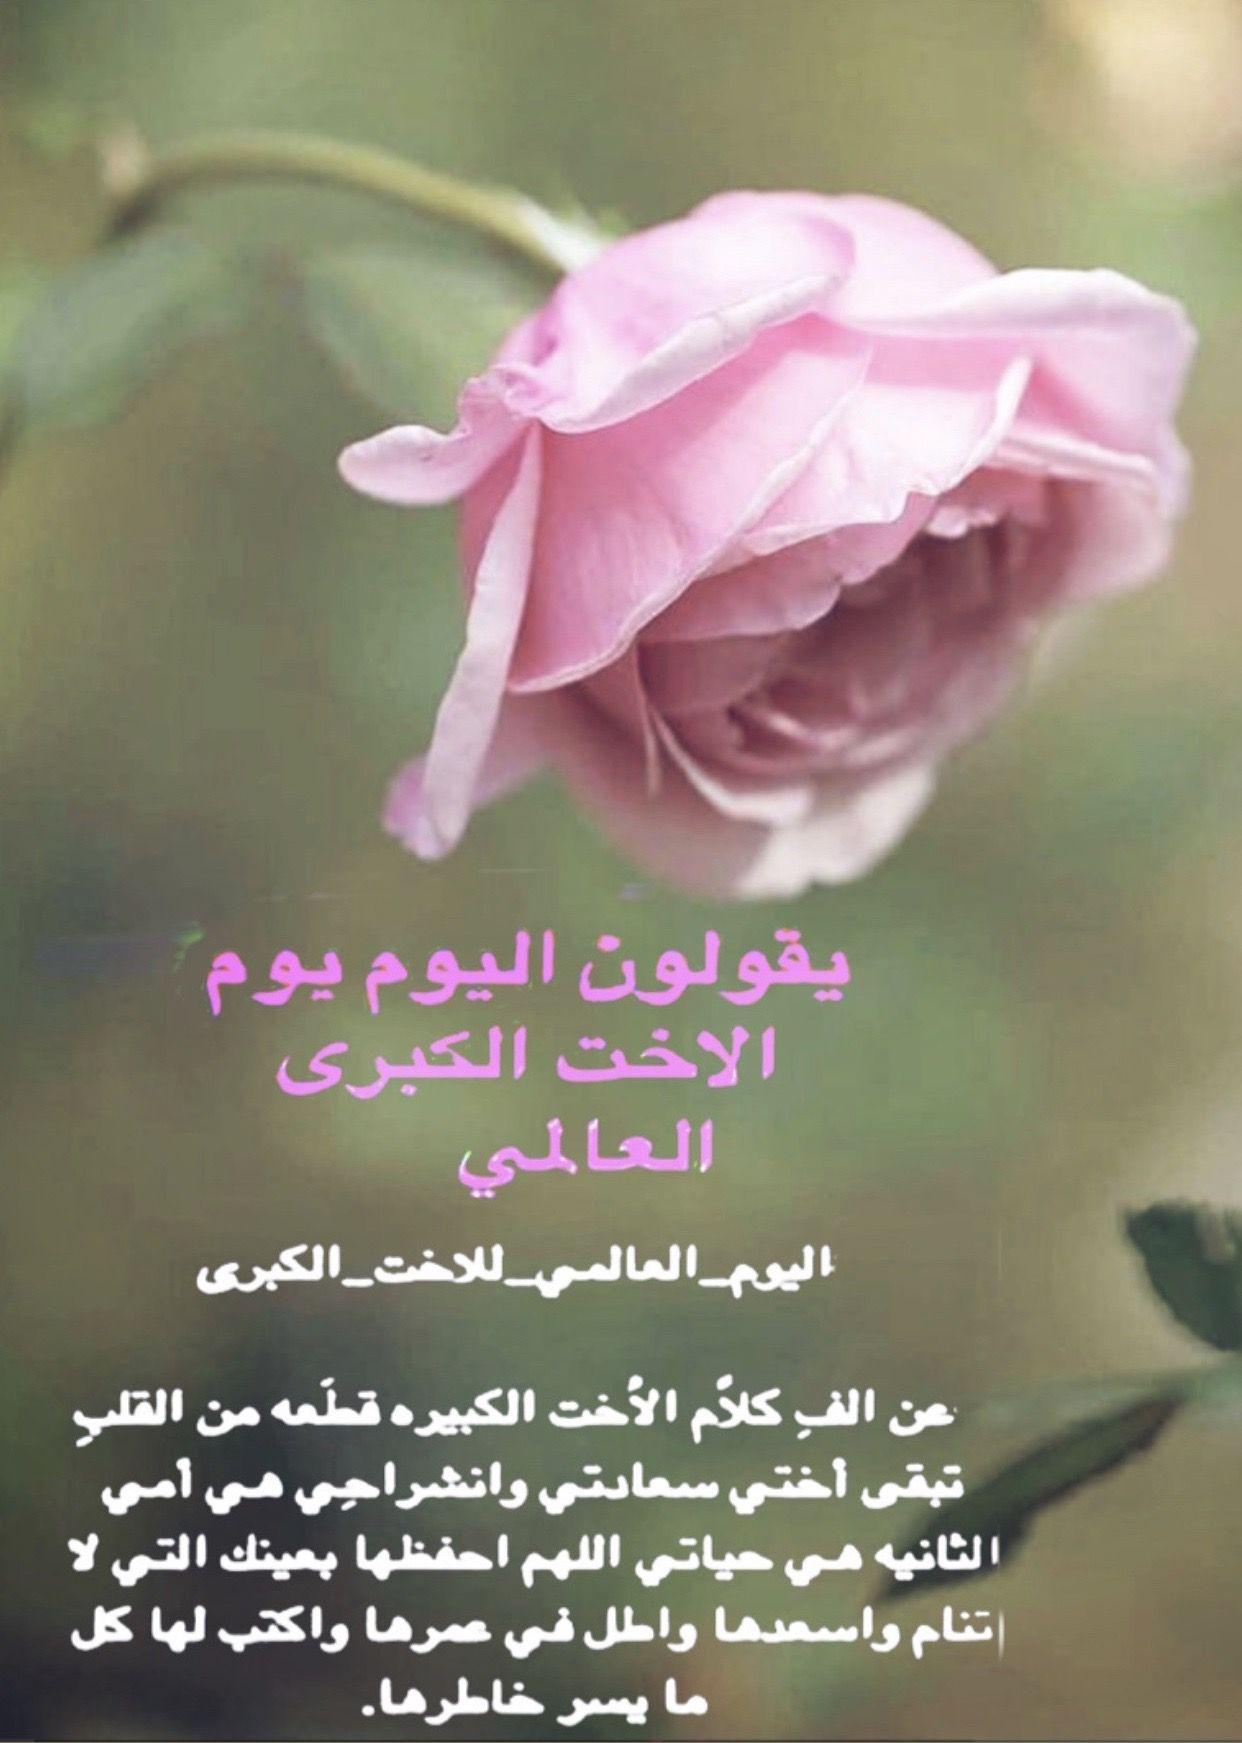 Pin By Foooz On شعر وشعور Plants Rose Flowers